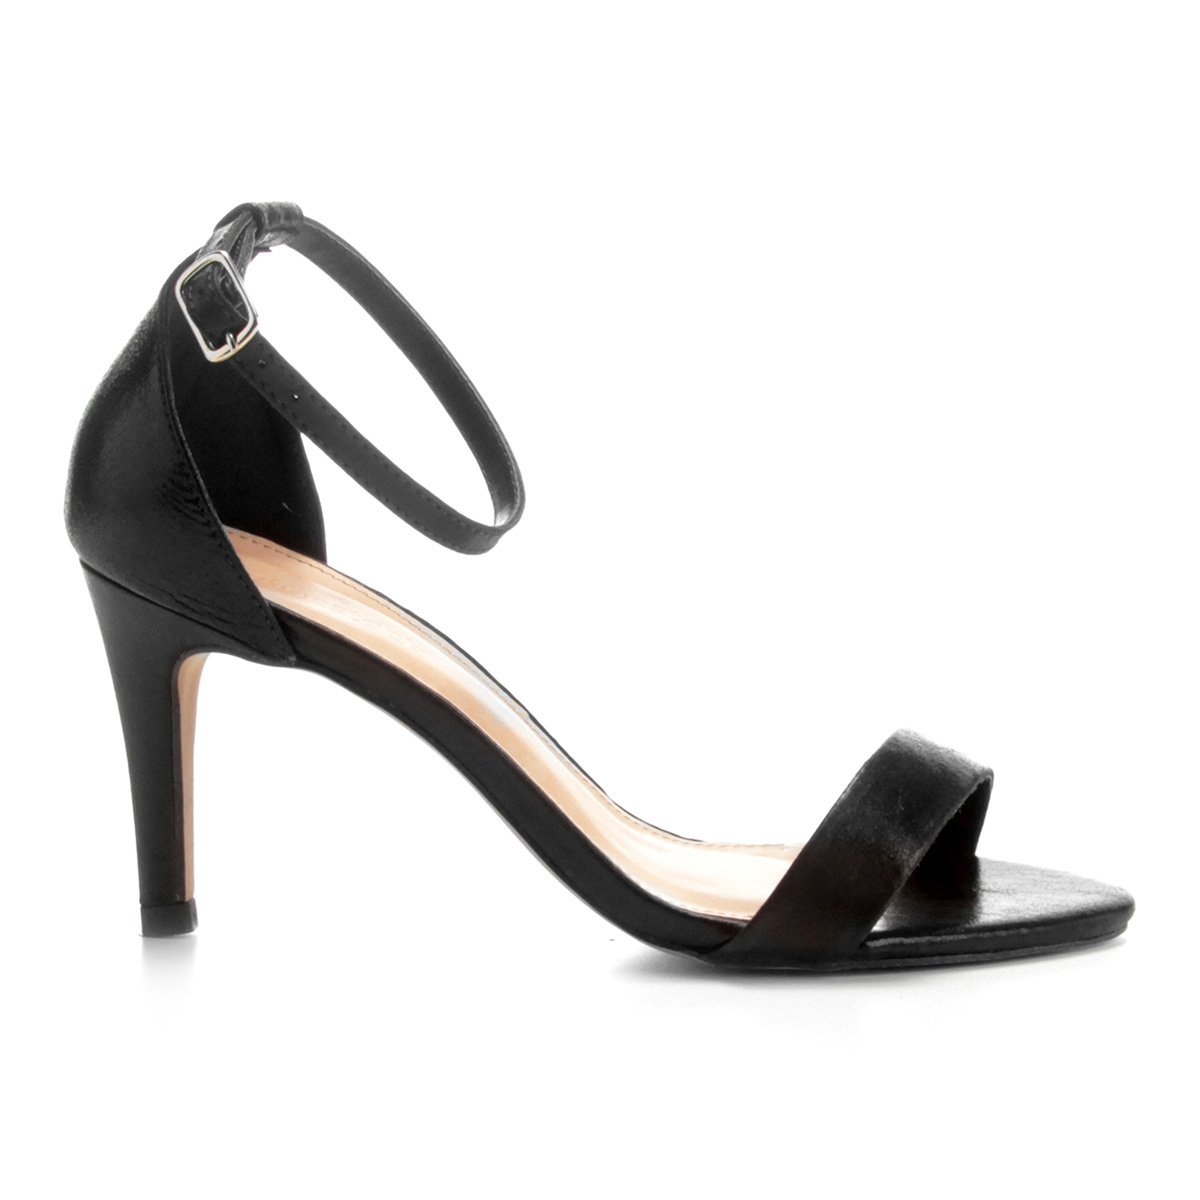 Sandália Sandália Shoestock Fino Feminina Salto Couro Couro Naked Shoestock Preto PPxwqErv4